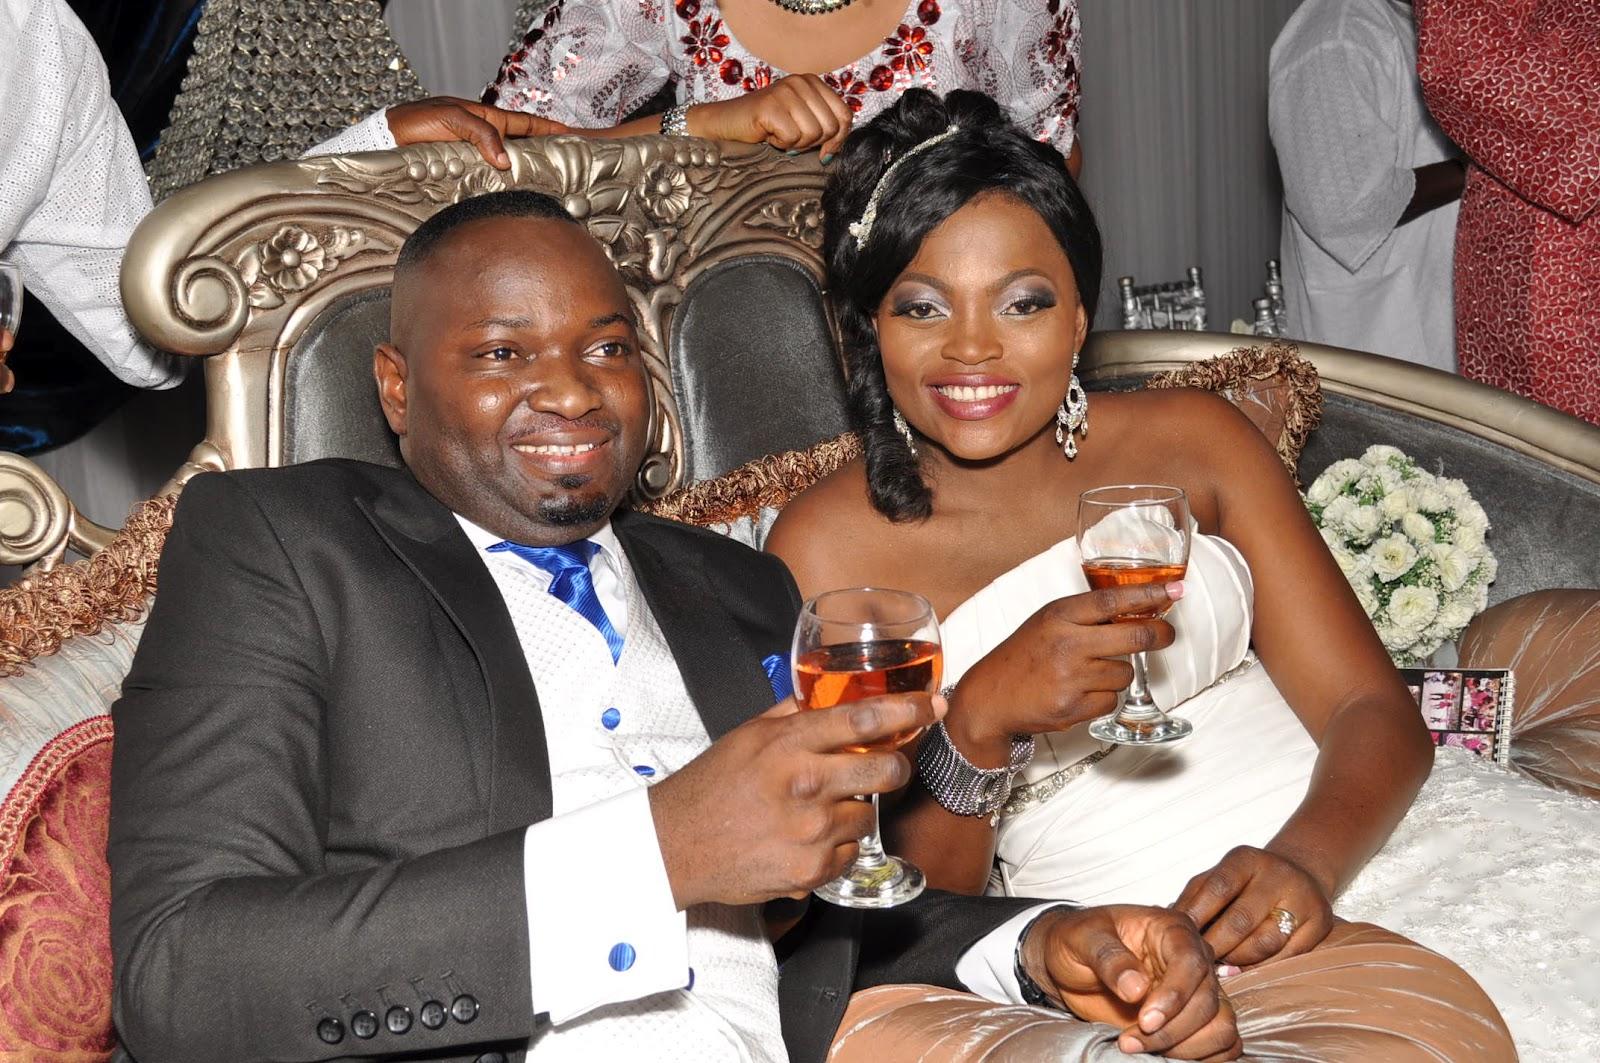 FUNKE AKINDELE WEDDING PHOTOS INI EDO GENEVIEVE NNAJI AND OTHERS GRACE THE ALL STAR